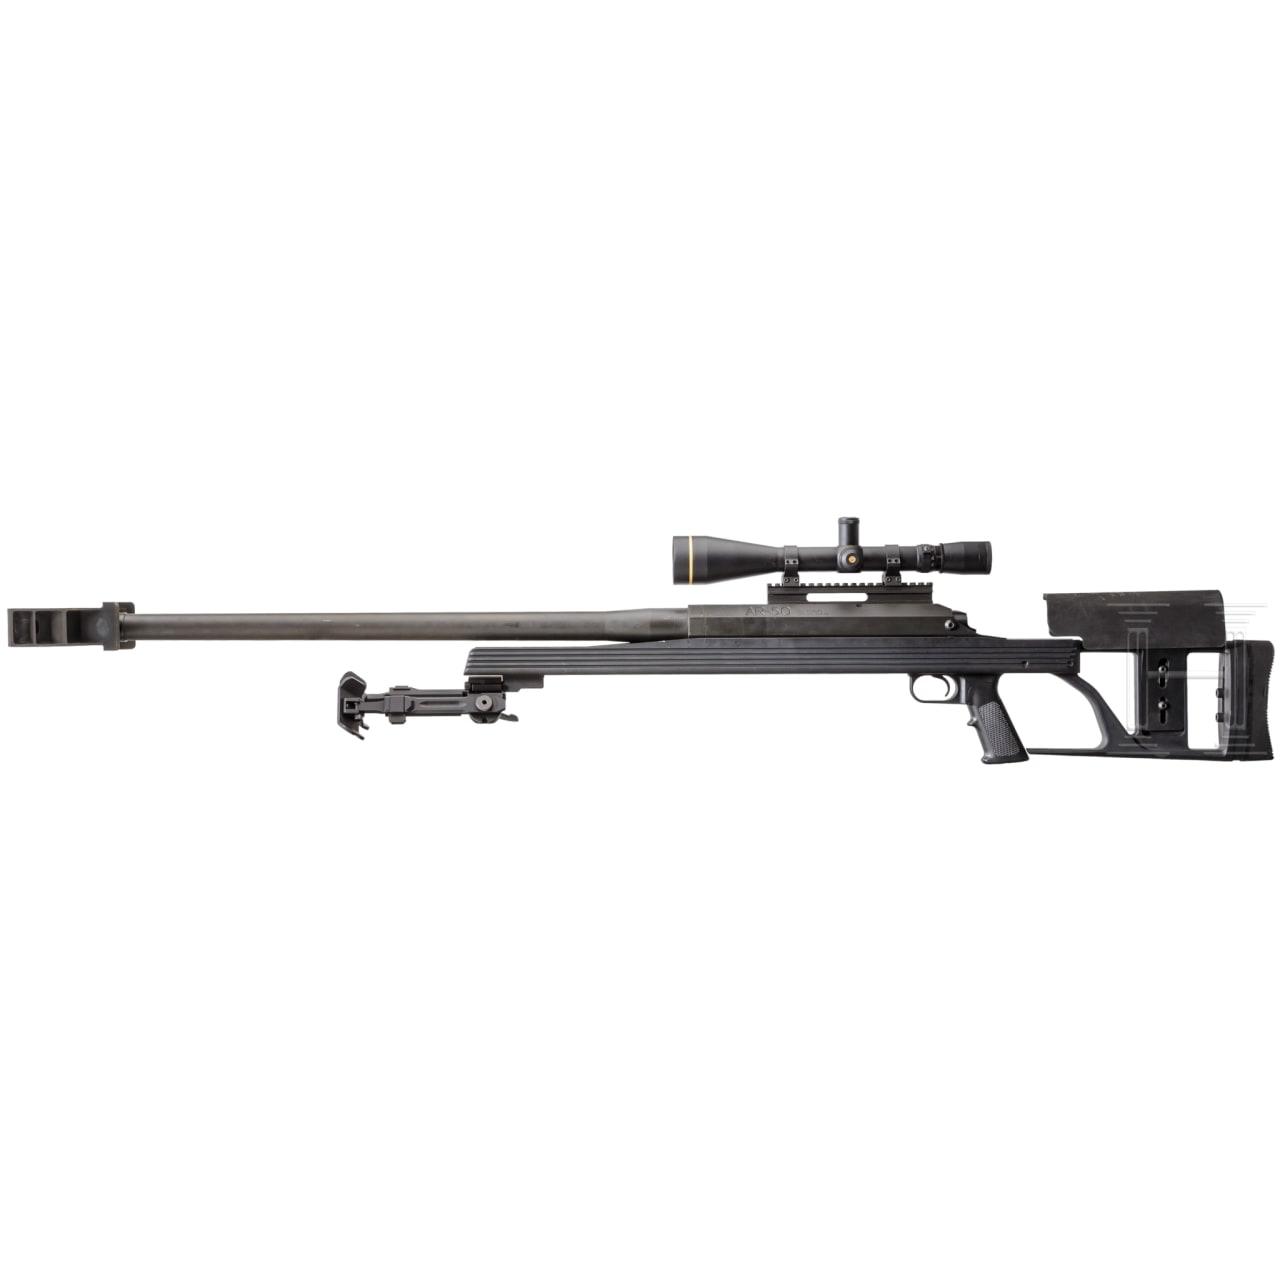 Armalite Mod. AR-50, with scope and bipod